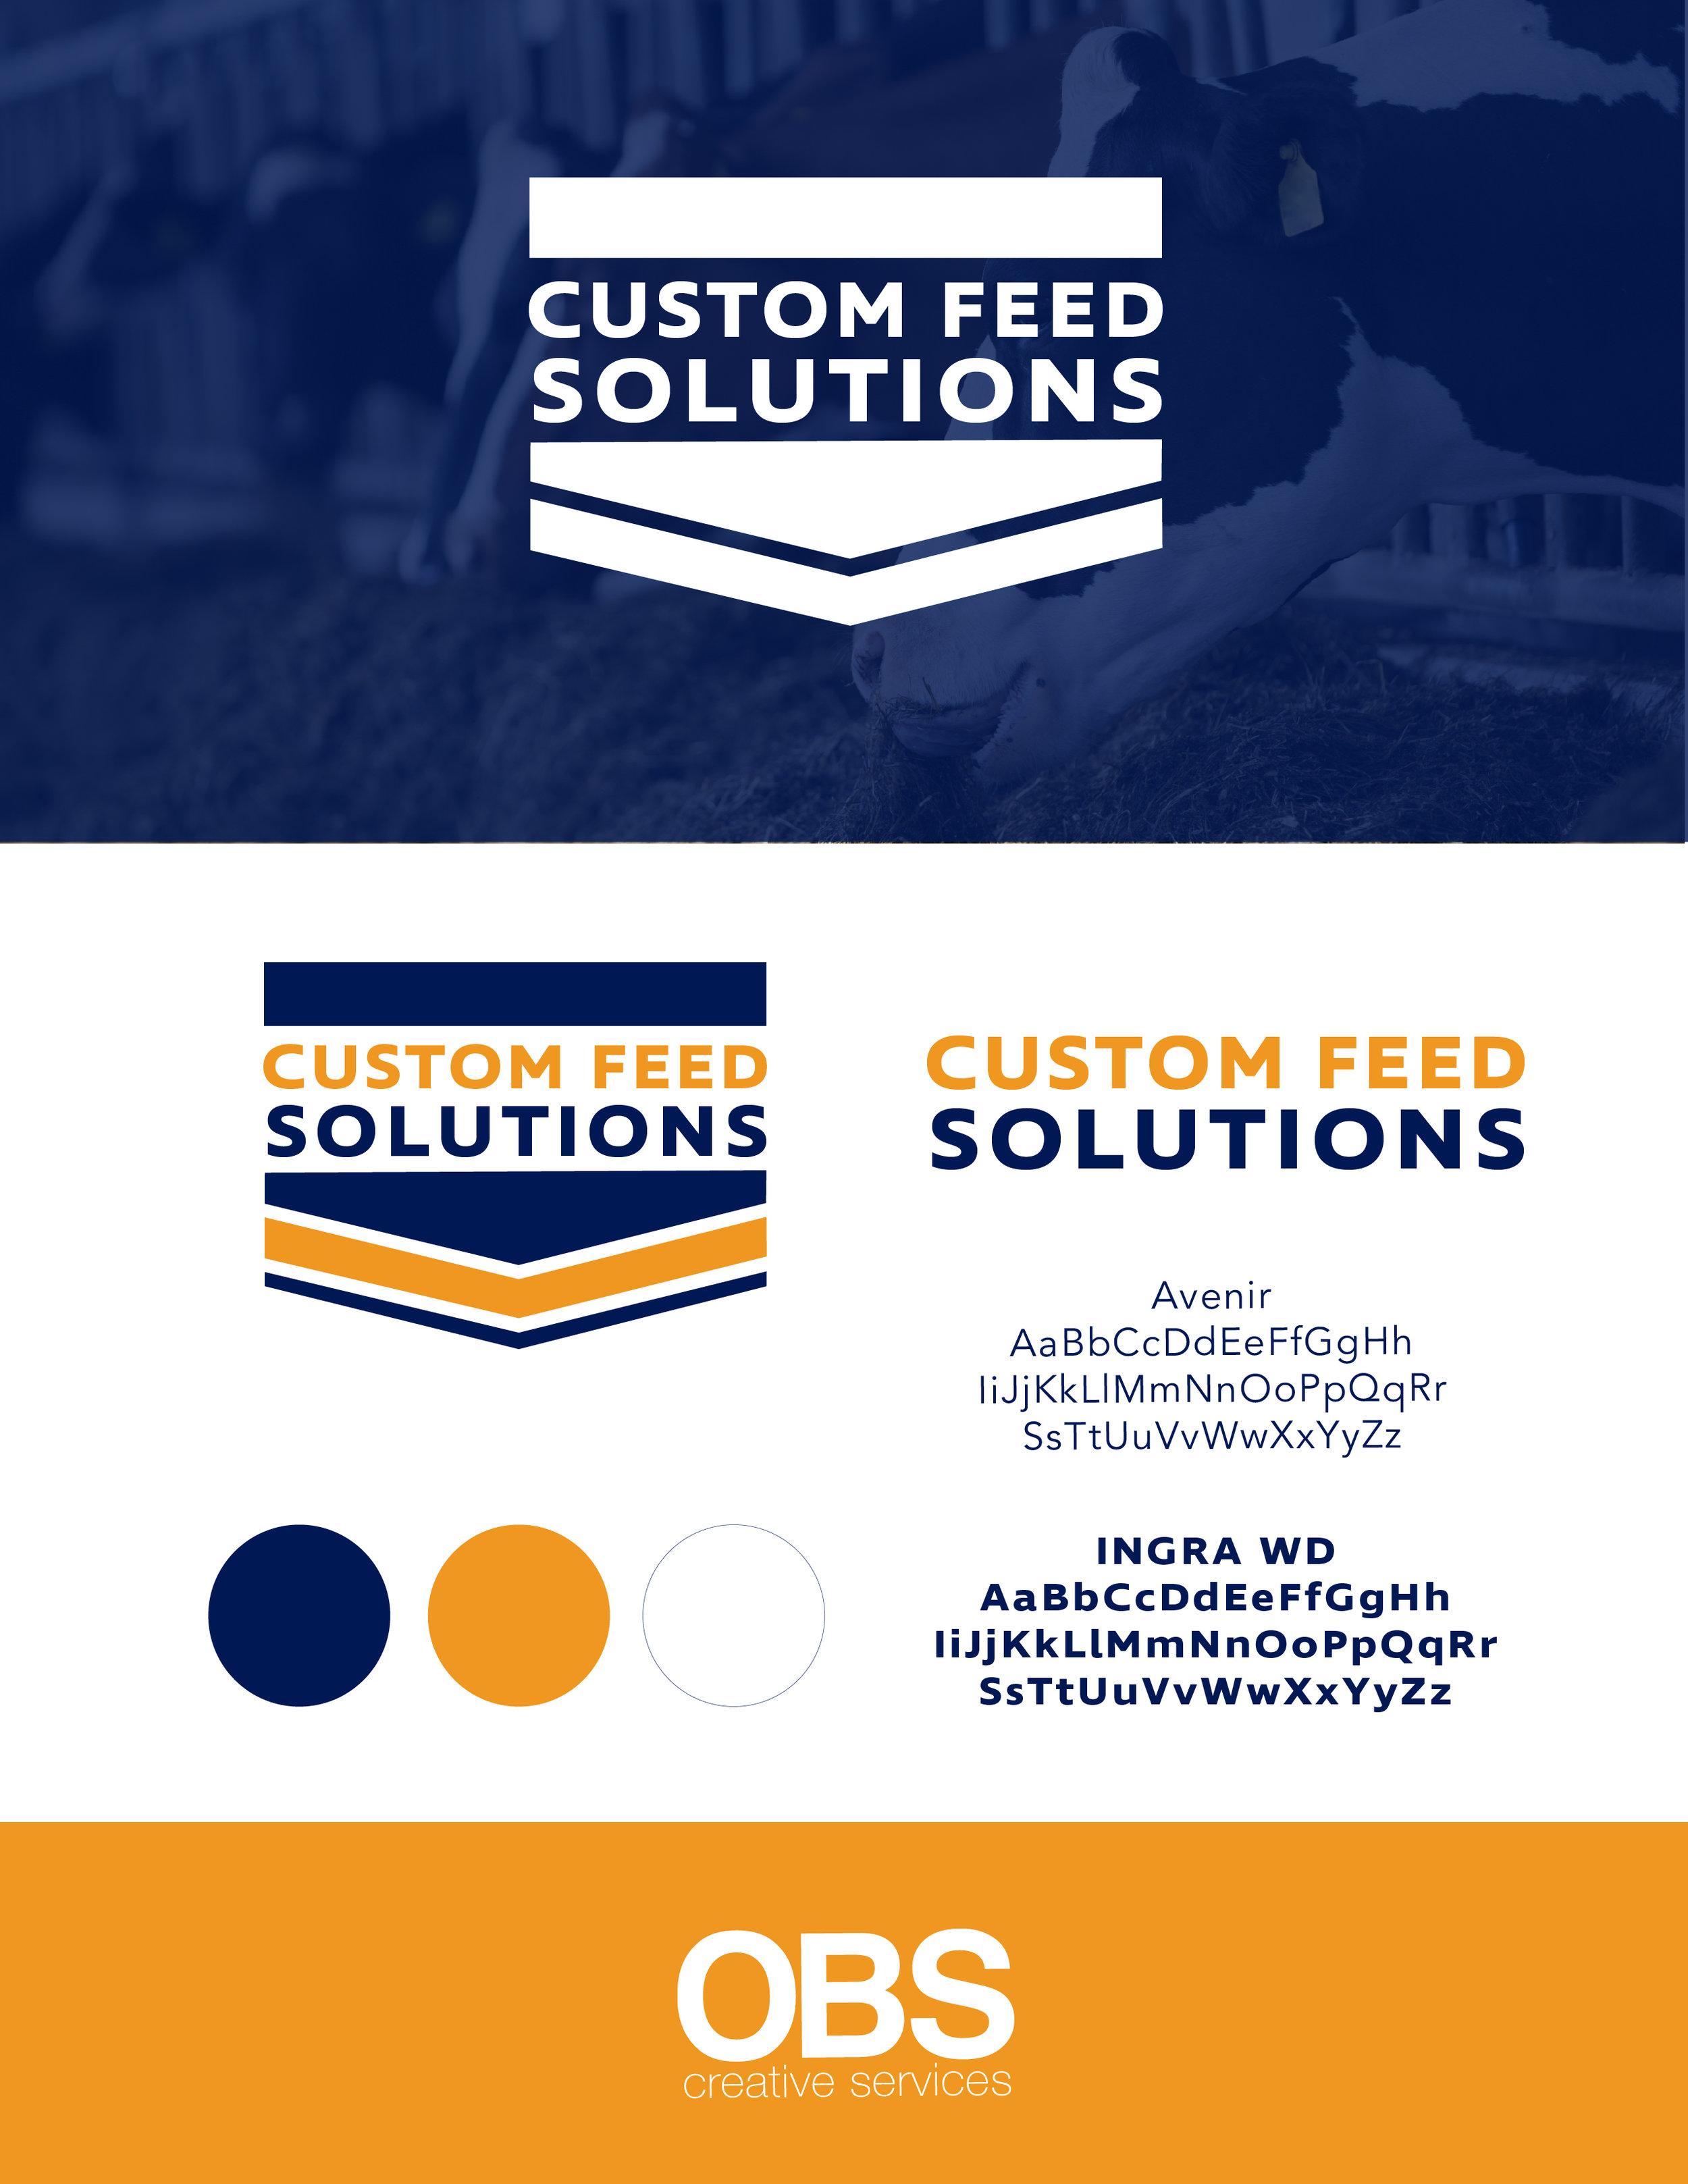 Custom Feed Solutions@300x-100.jpg